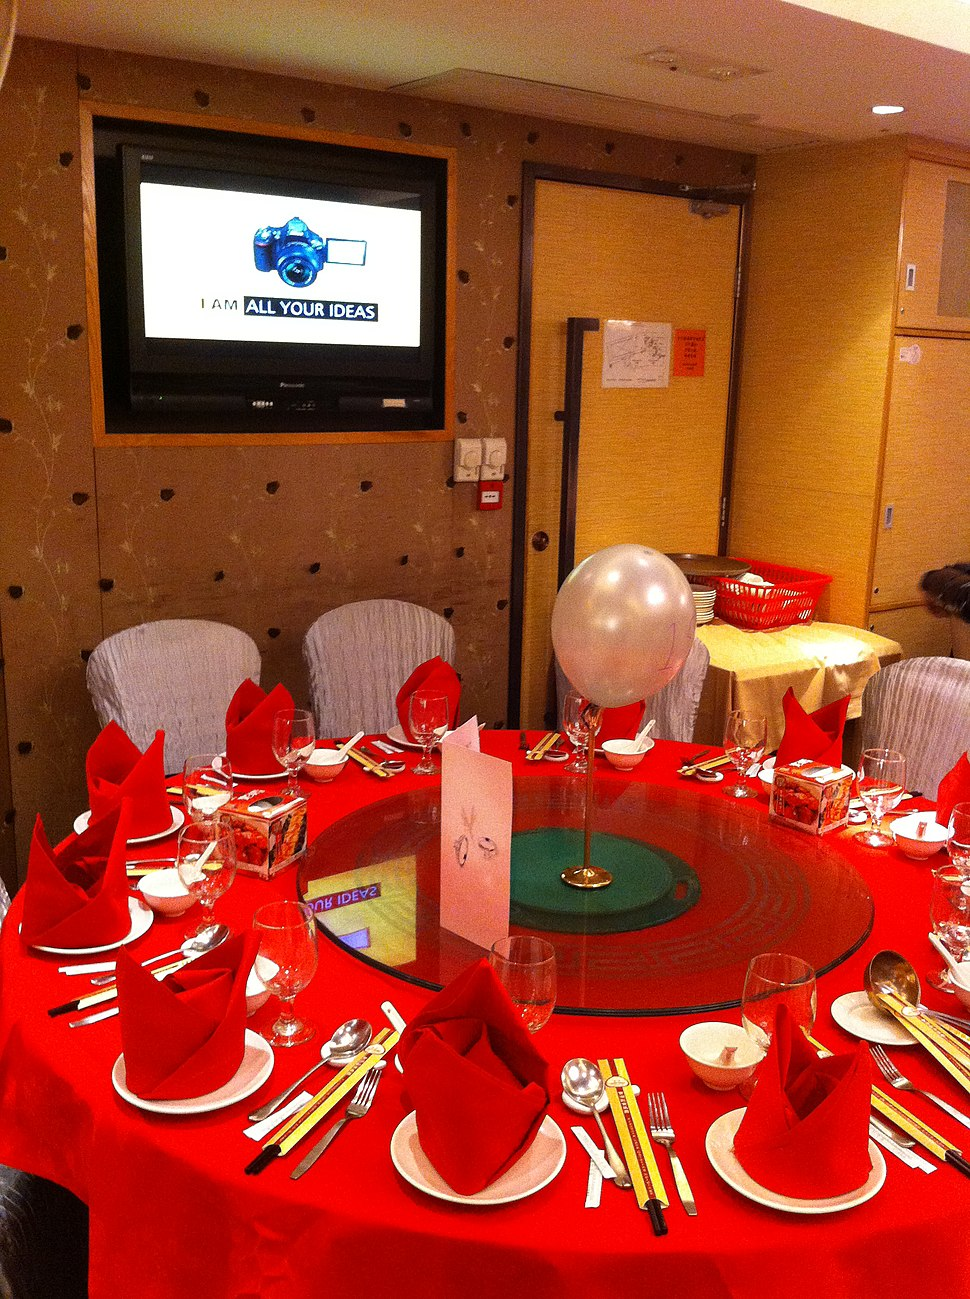 HK 海怡半島 South Horizons 住戶俱樂部 Residents Club Dinner 寶湖酒家 Treasure Lake Restaurant red tablecloth n setting Wall TV set Jan-2013